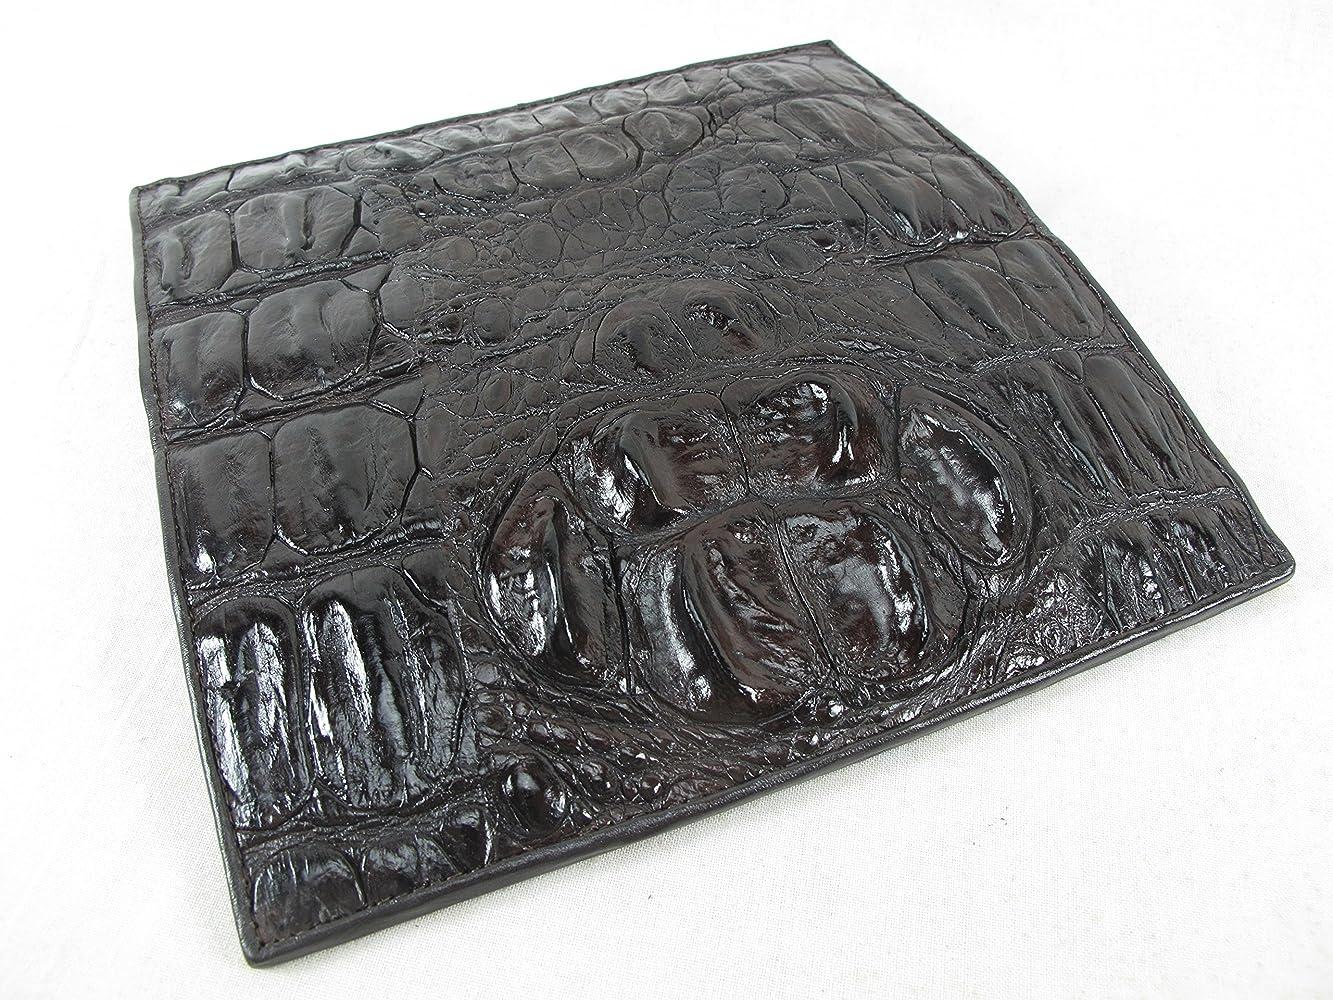 PELGIO Genuine Crocodile Alligator Foot Claw Skin Leather Handmade Wallet Brown